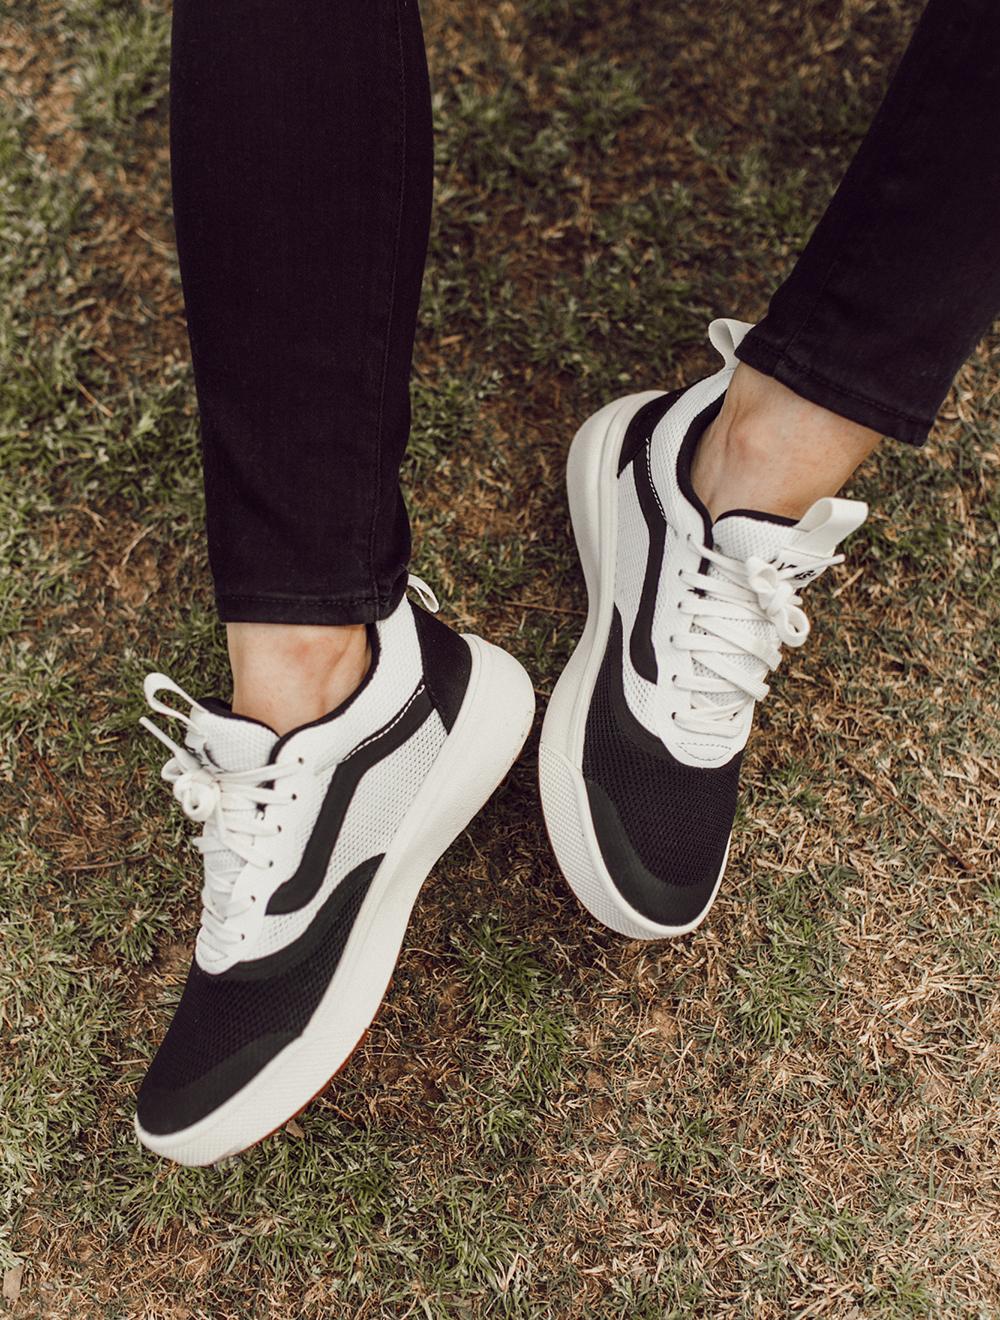 livvyland-blog-olivia-watson-austin-texas-lifestyle-fashion-blogger-zilker-park-vans-ultrarange-rapidweld-sneakers-1